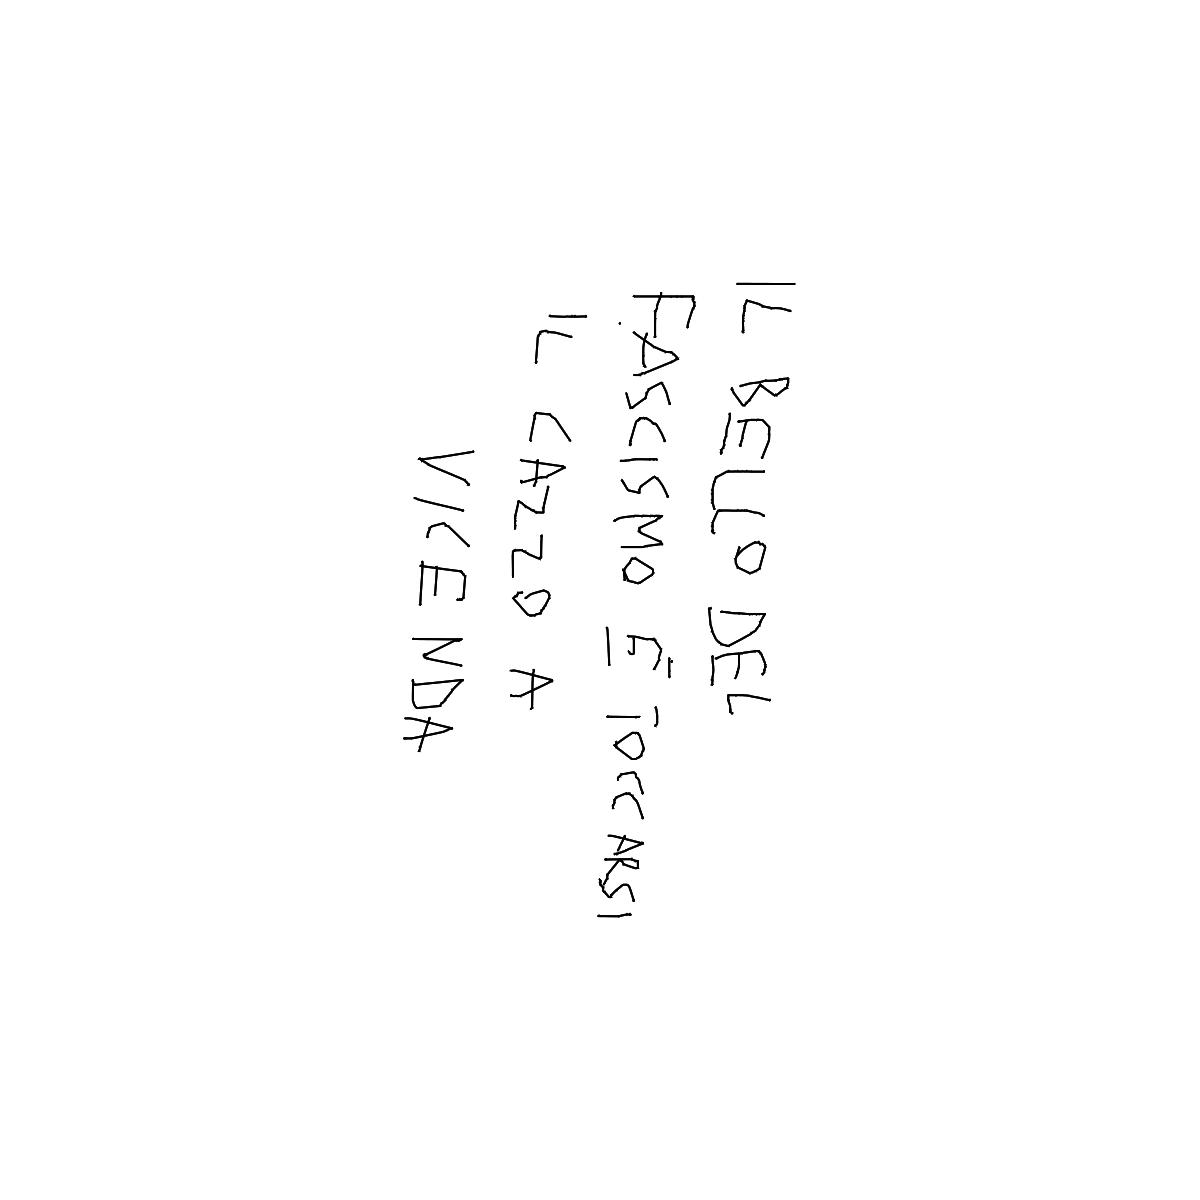 BAAAM drawing#17351 lat:44.1044692993164060lng: 11.9837923049926760